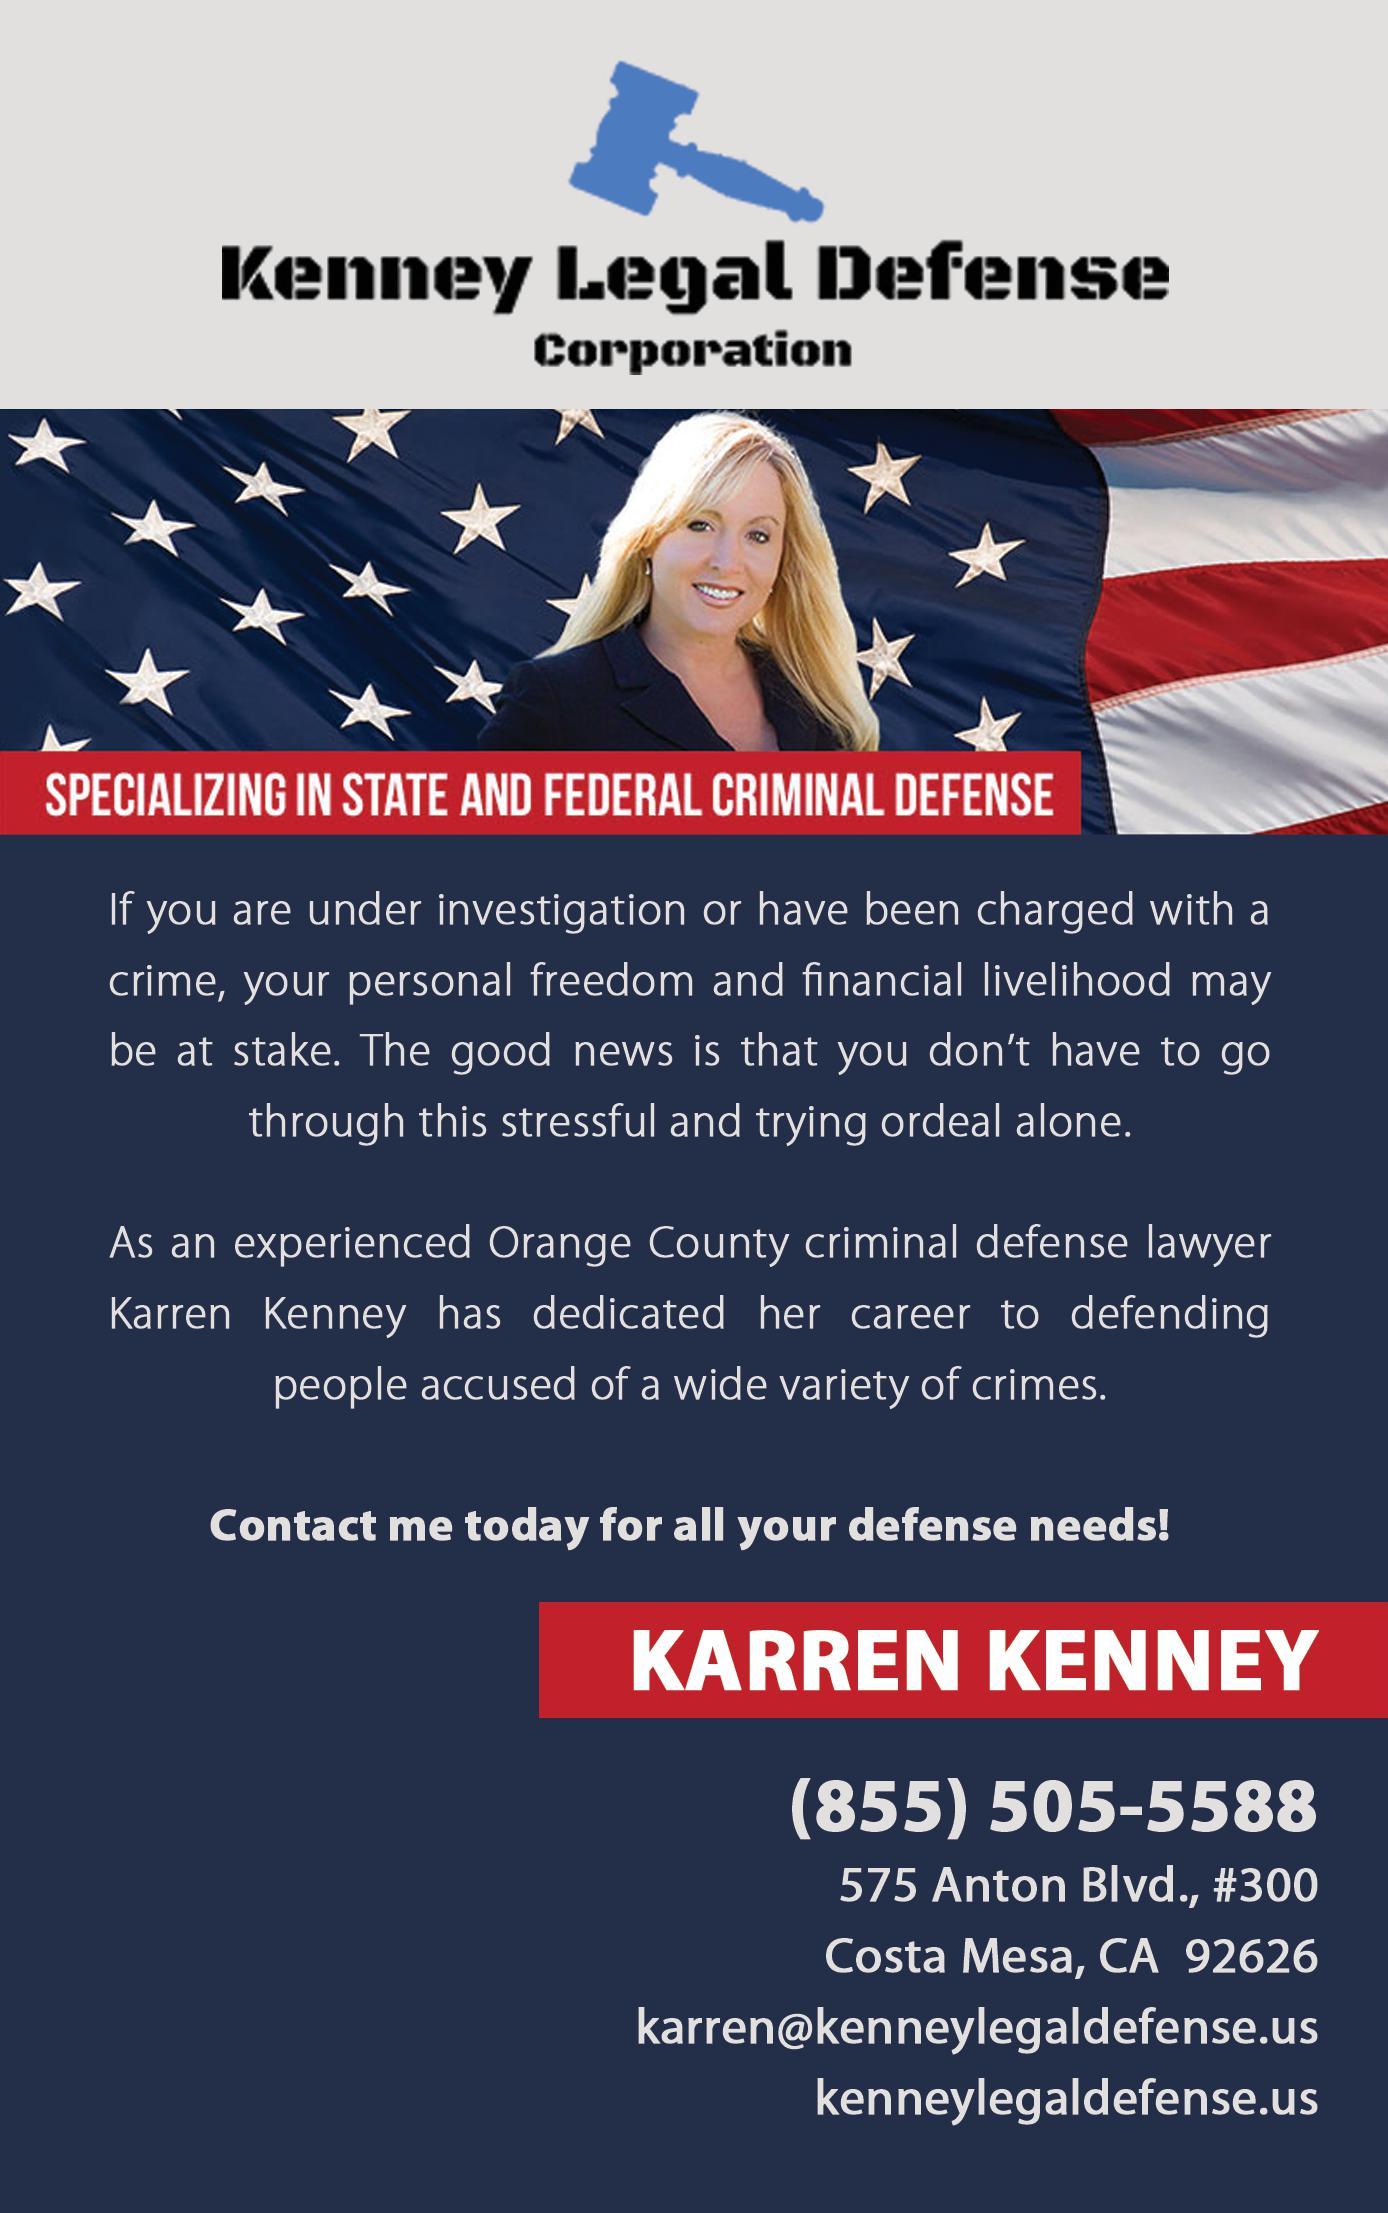 Kenney Legal Defense Corporation